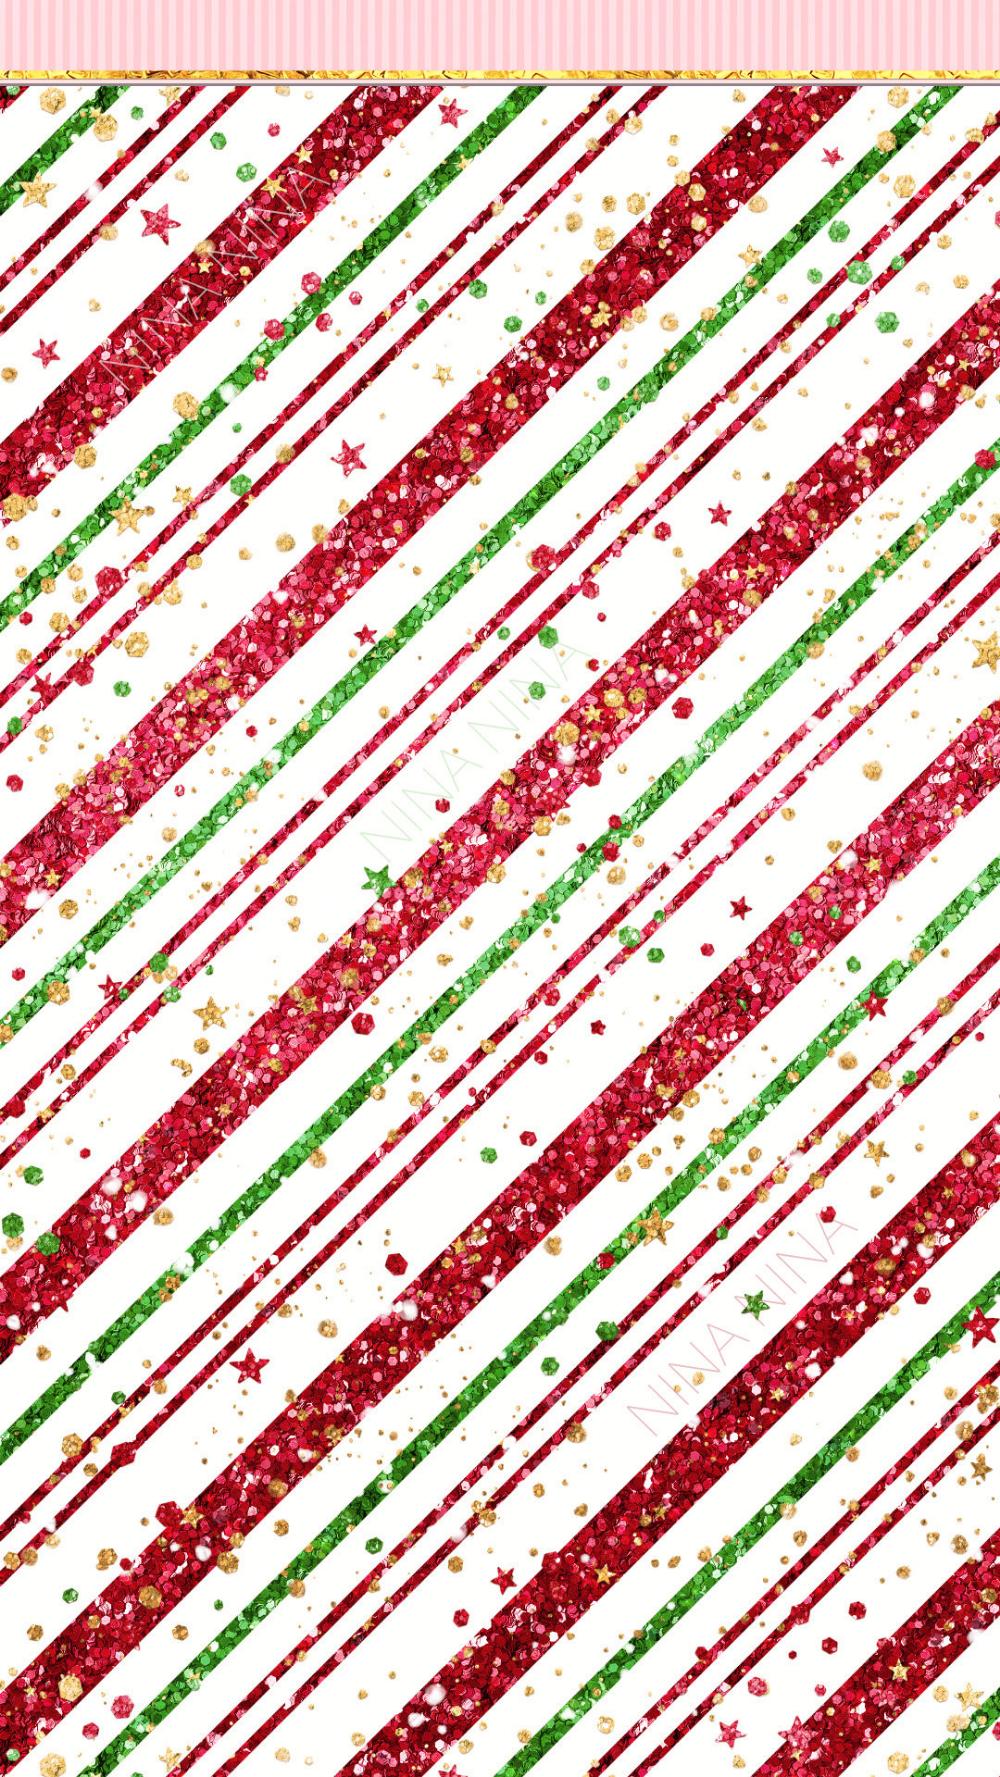 Candy Cane Stripes Wallpaper Christmas Christmas Wallpaper Christmasbackground Wallpaper Iphone Christmas Christmas Phone Wallpaper Holiday Iphone Wallpaper